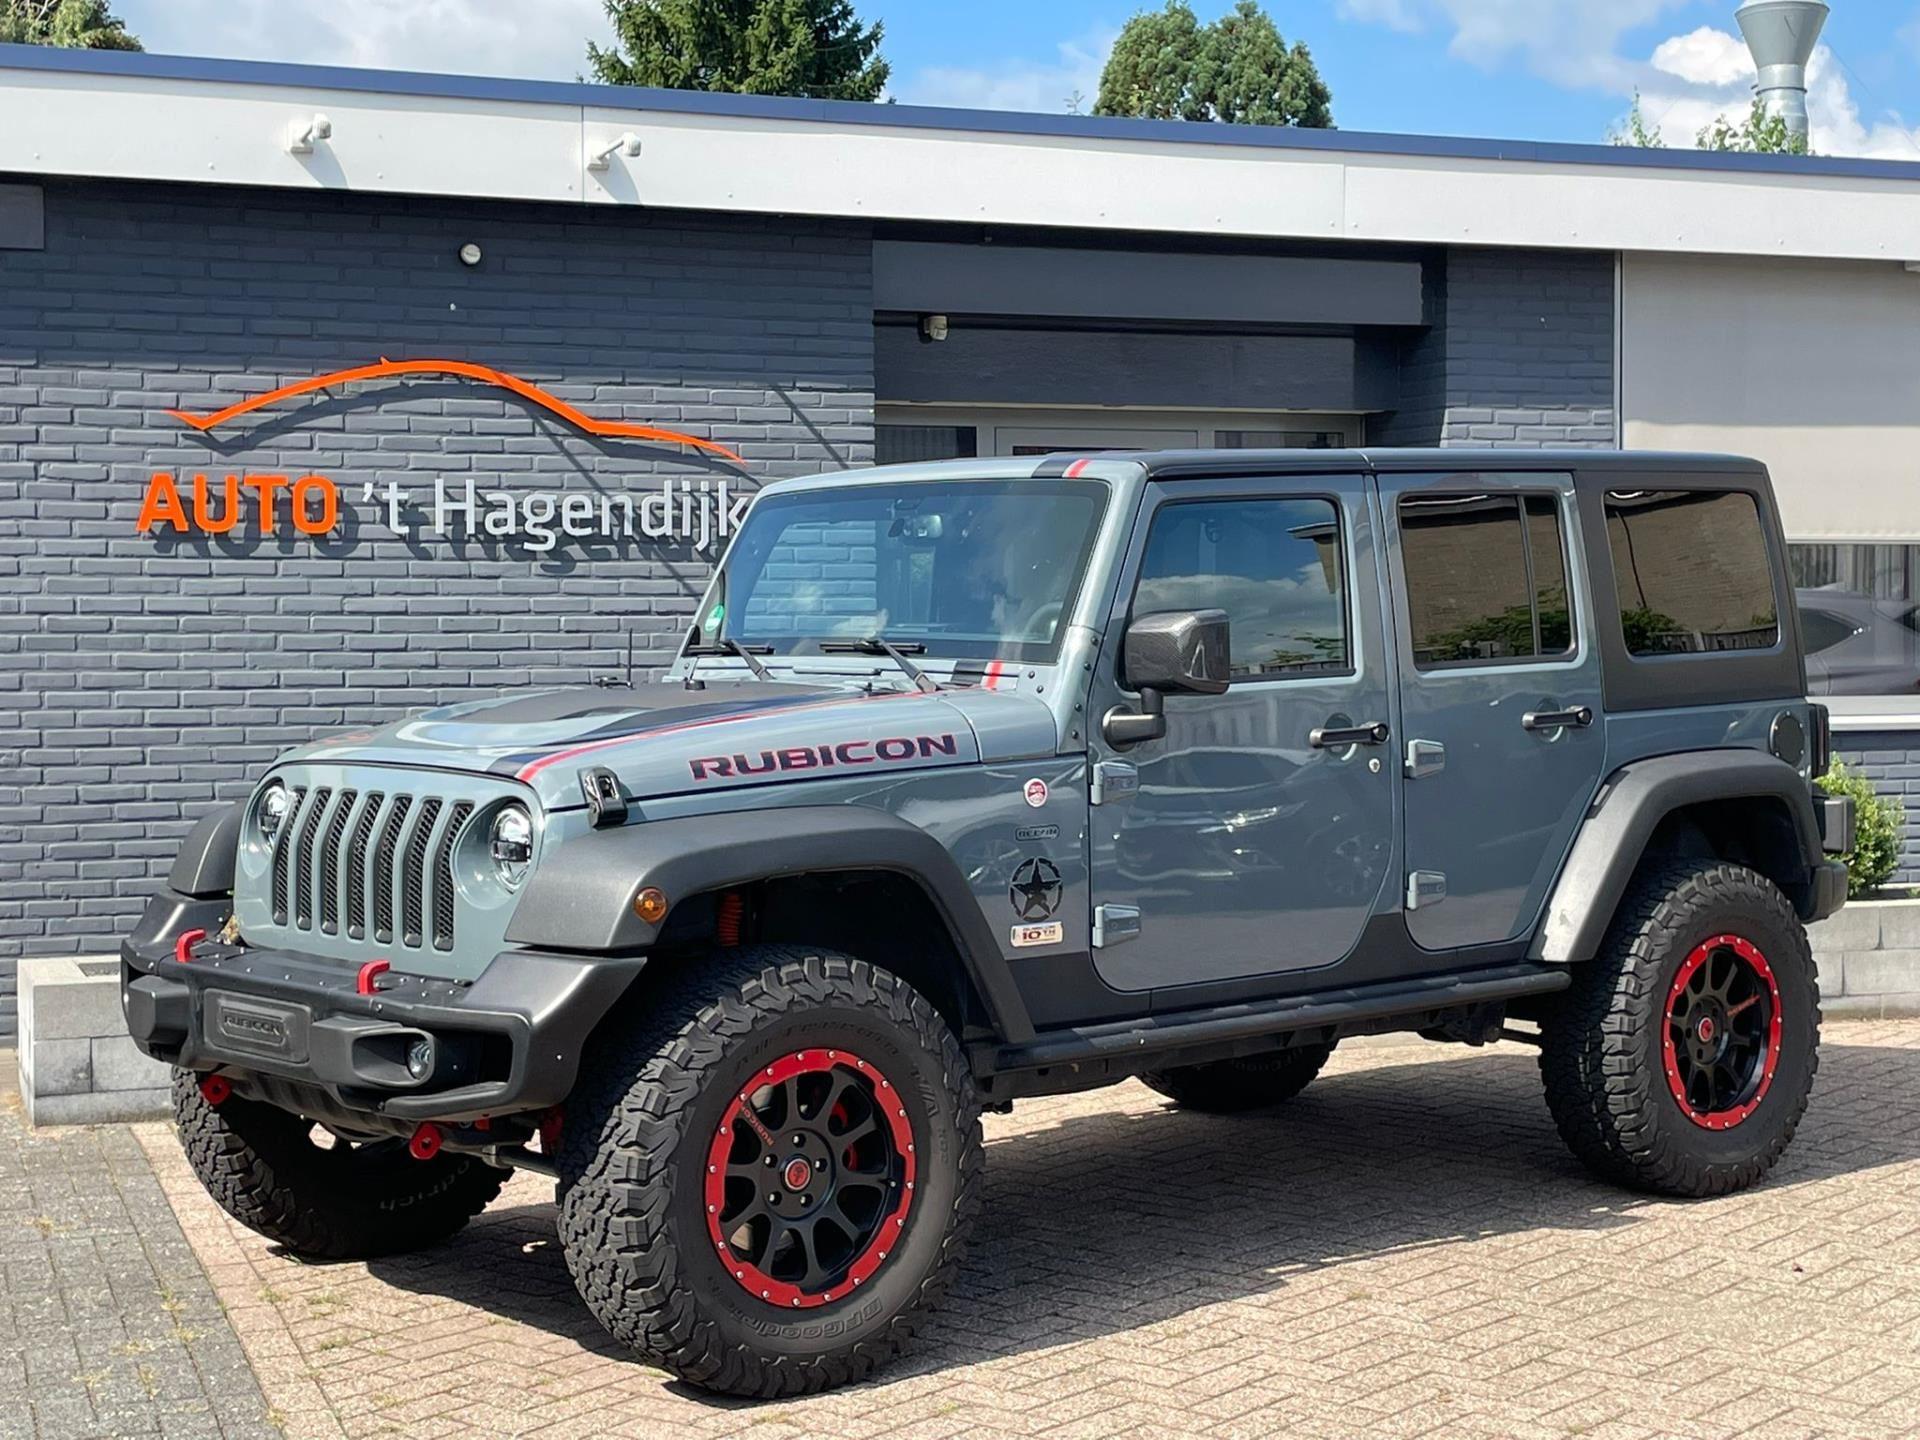 Jeep Wrangler Unlimited occasion - Auto 't Hagendijk